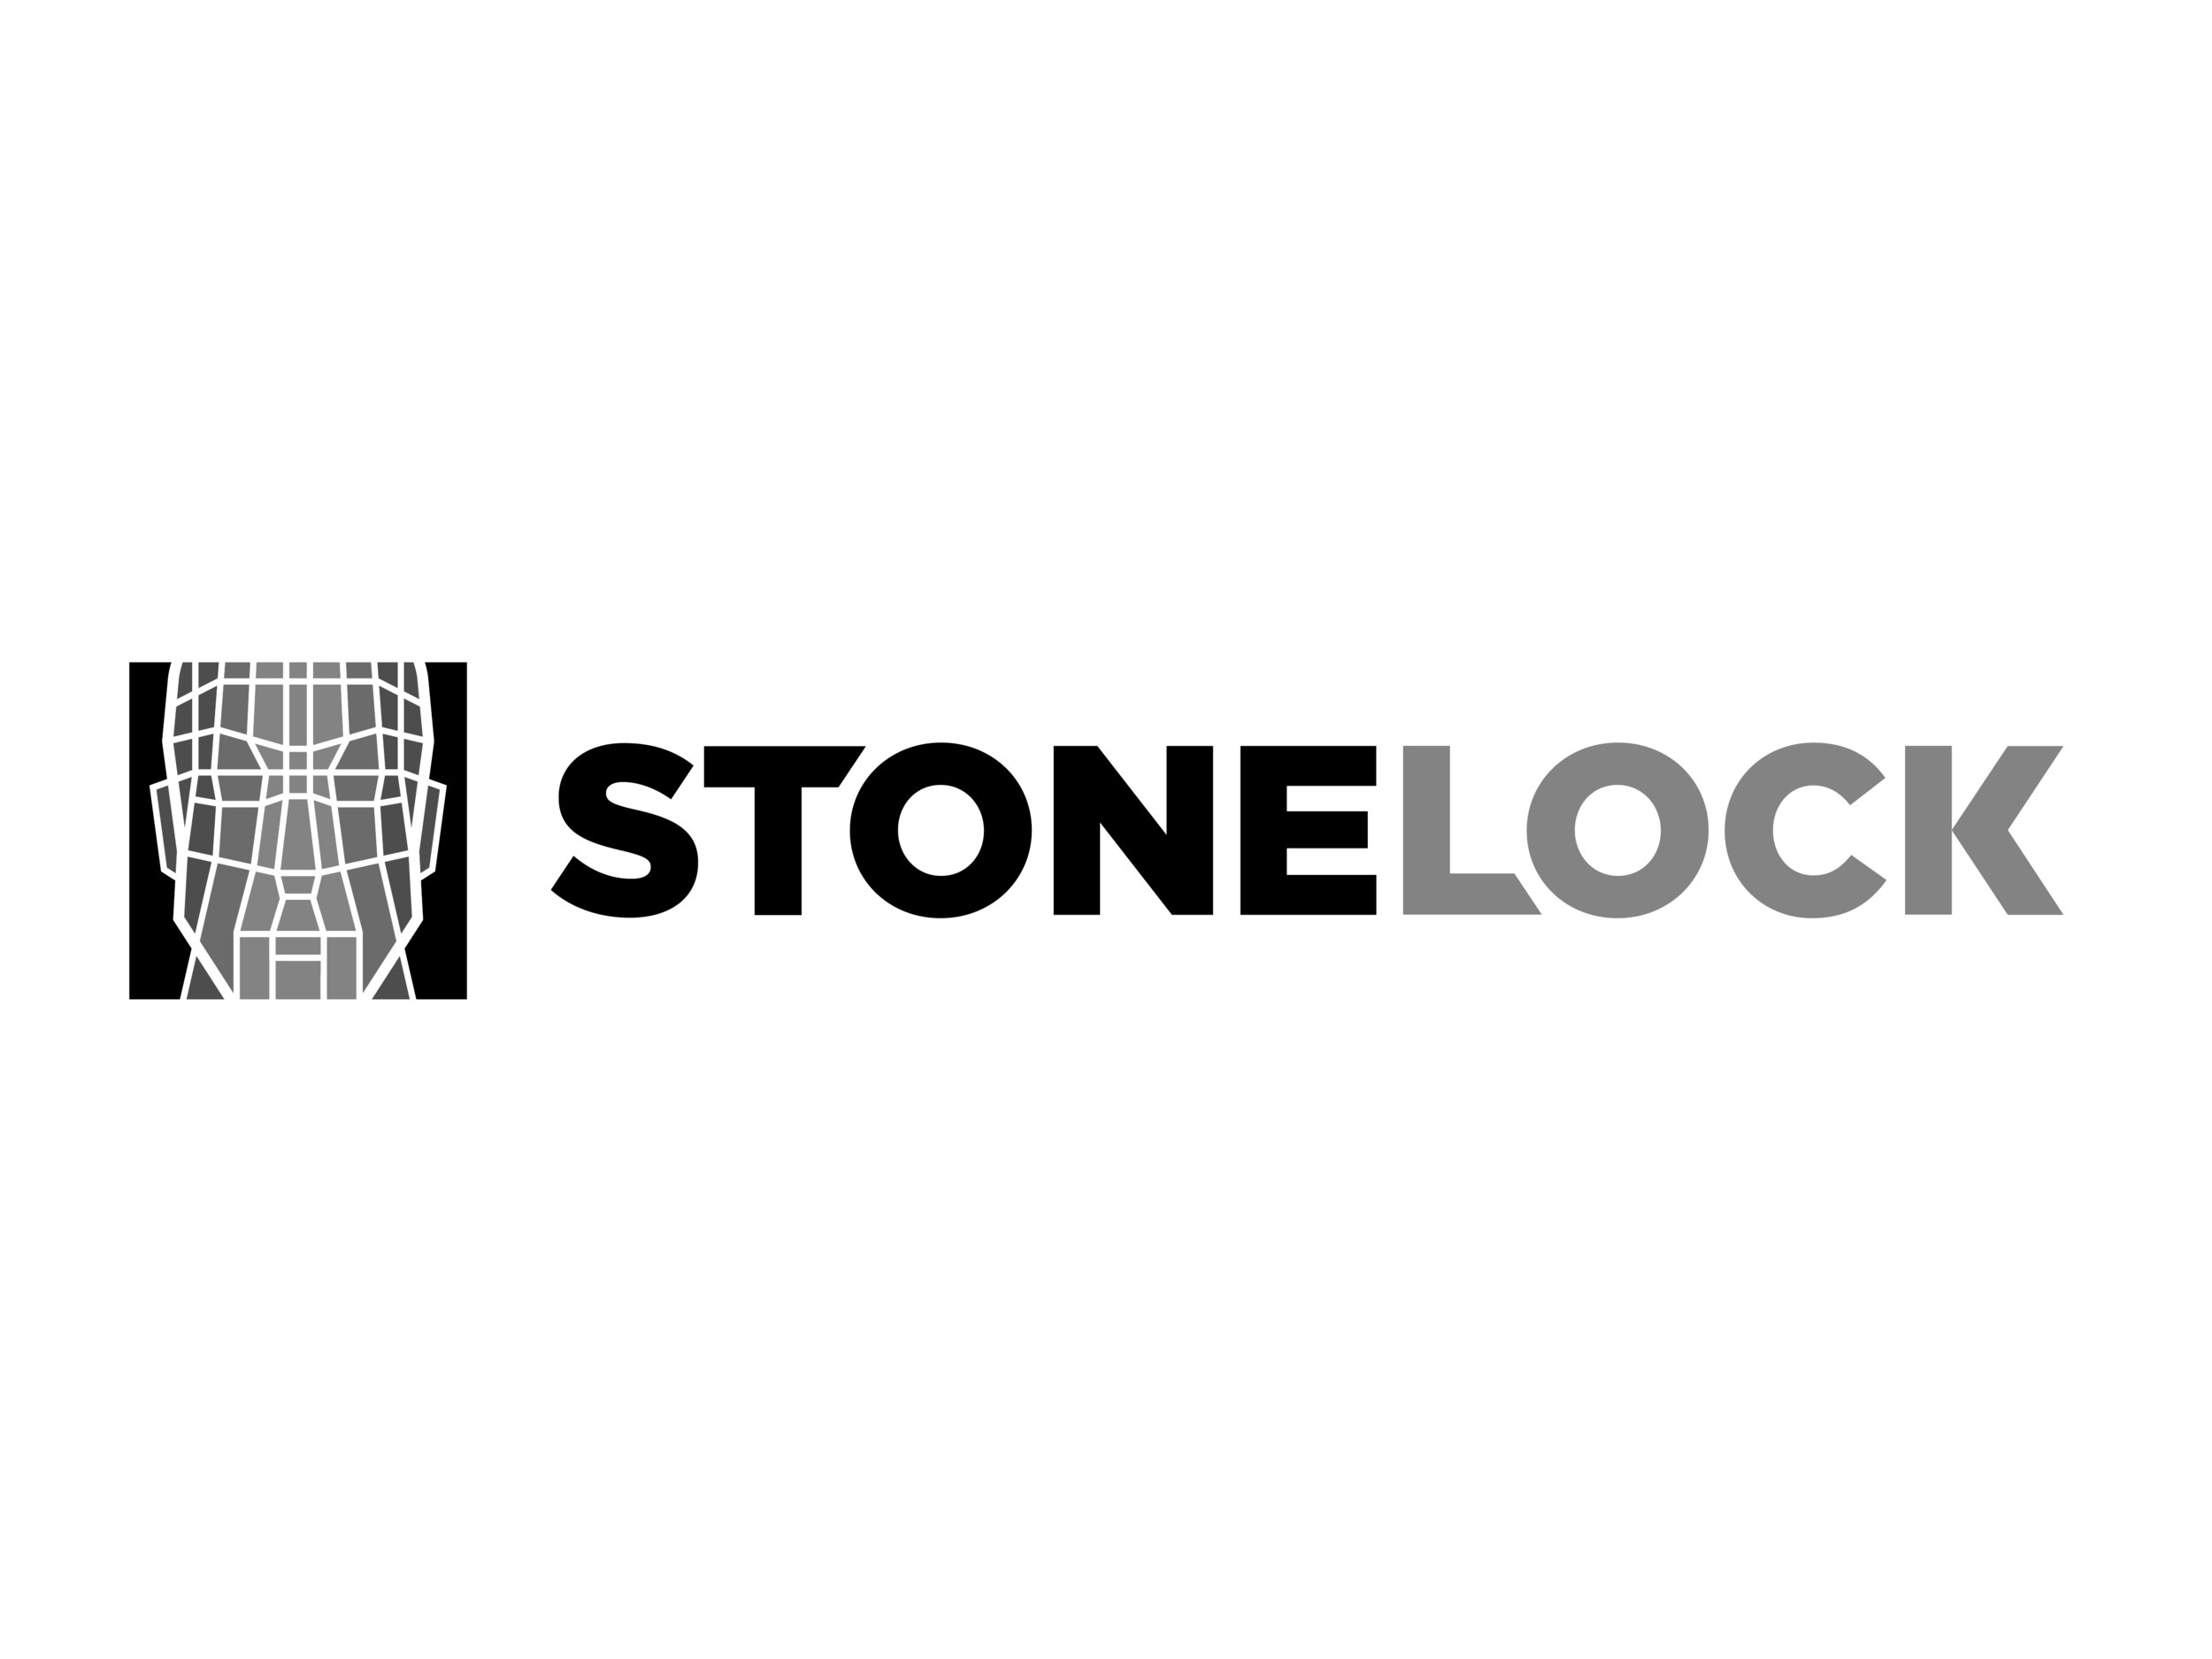 STONELOCK_2017.jpg